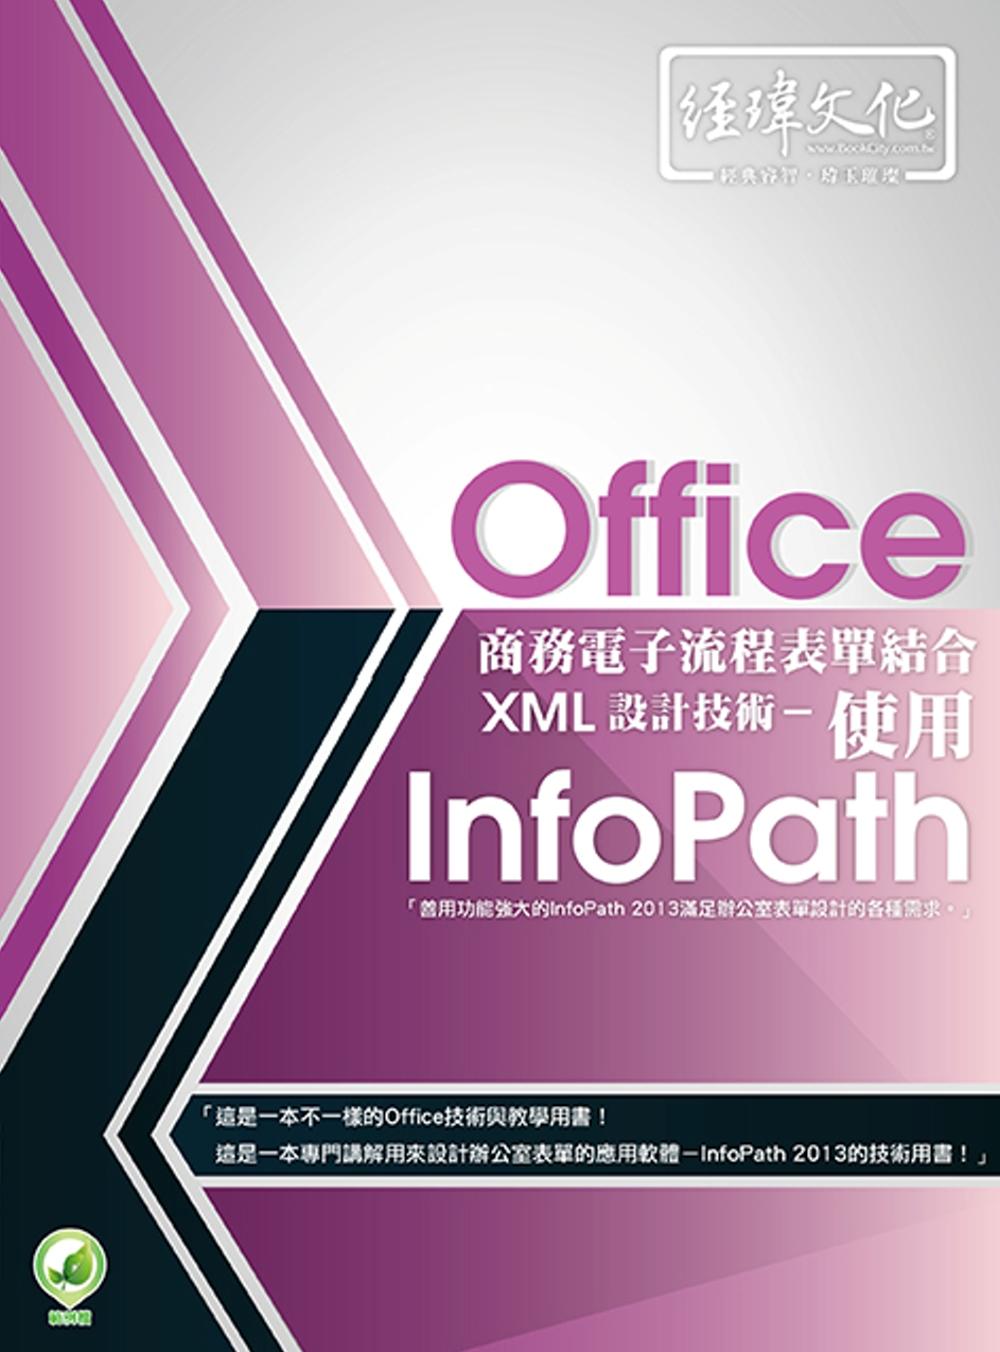 Office商務電子流程表單結合XML設計技術 – 使用 InfoPath(附綠色範例檔)